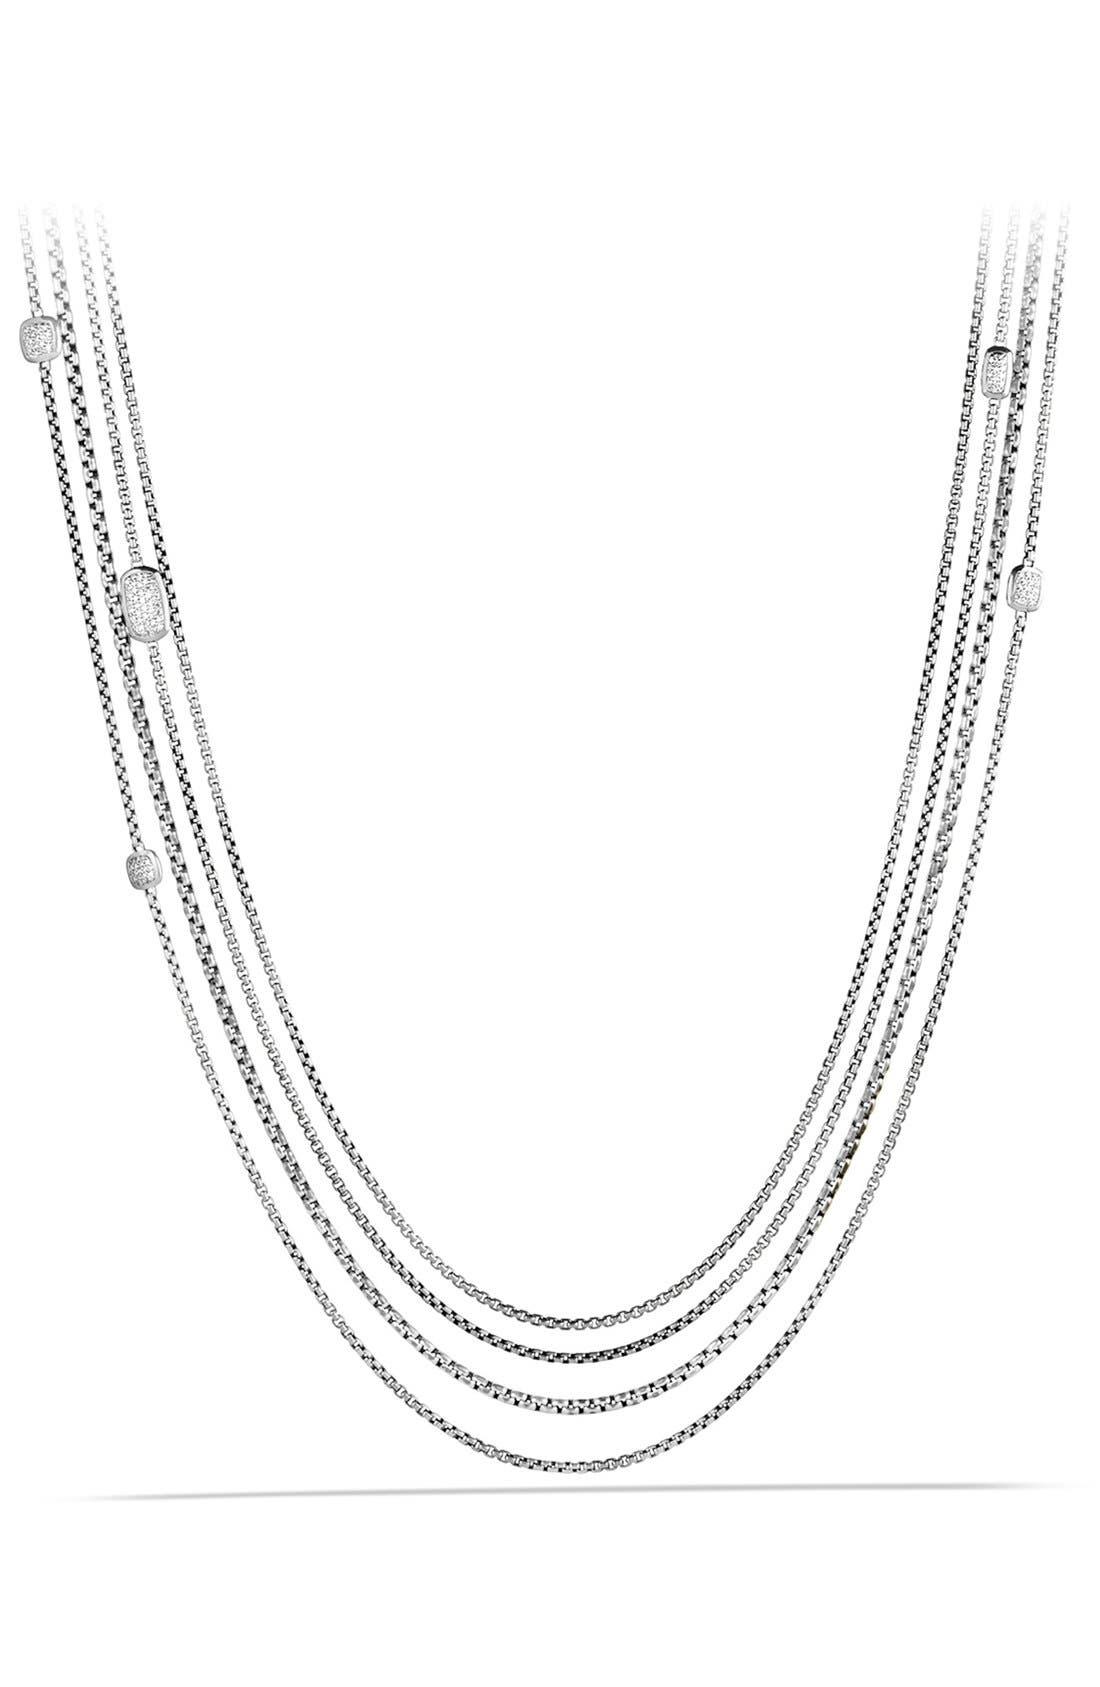 David Yurman 'Confetti' Station Necklace with Diamonds